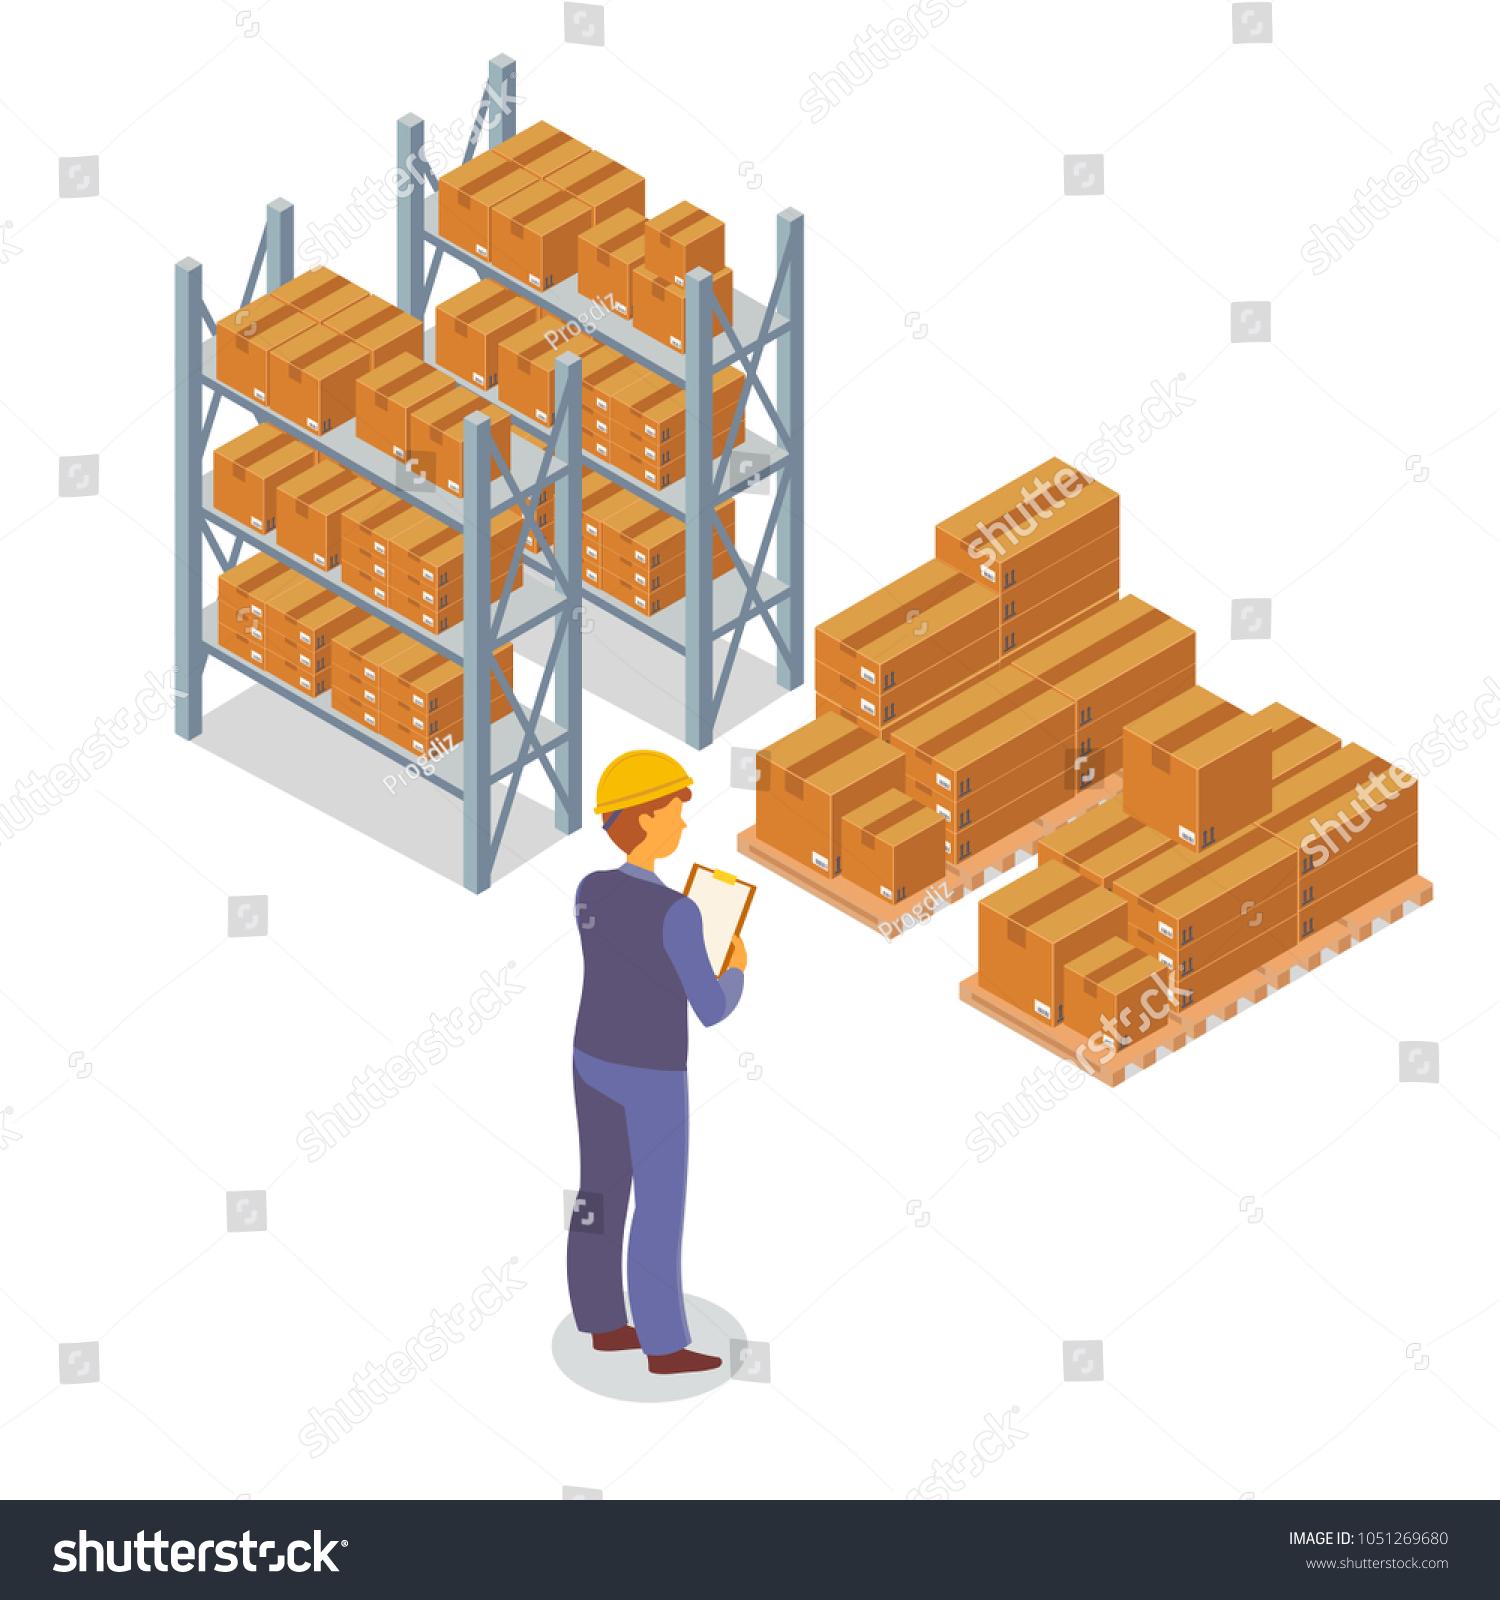 Isometric Box Cardboard Packaging Square Rectangular Stock